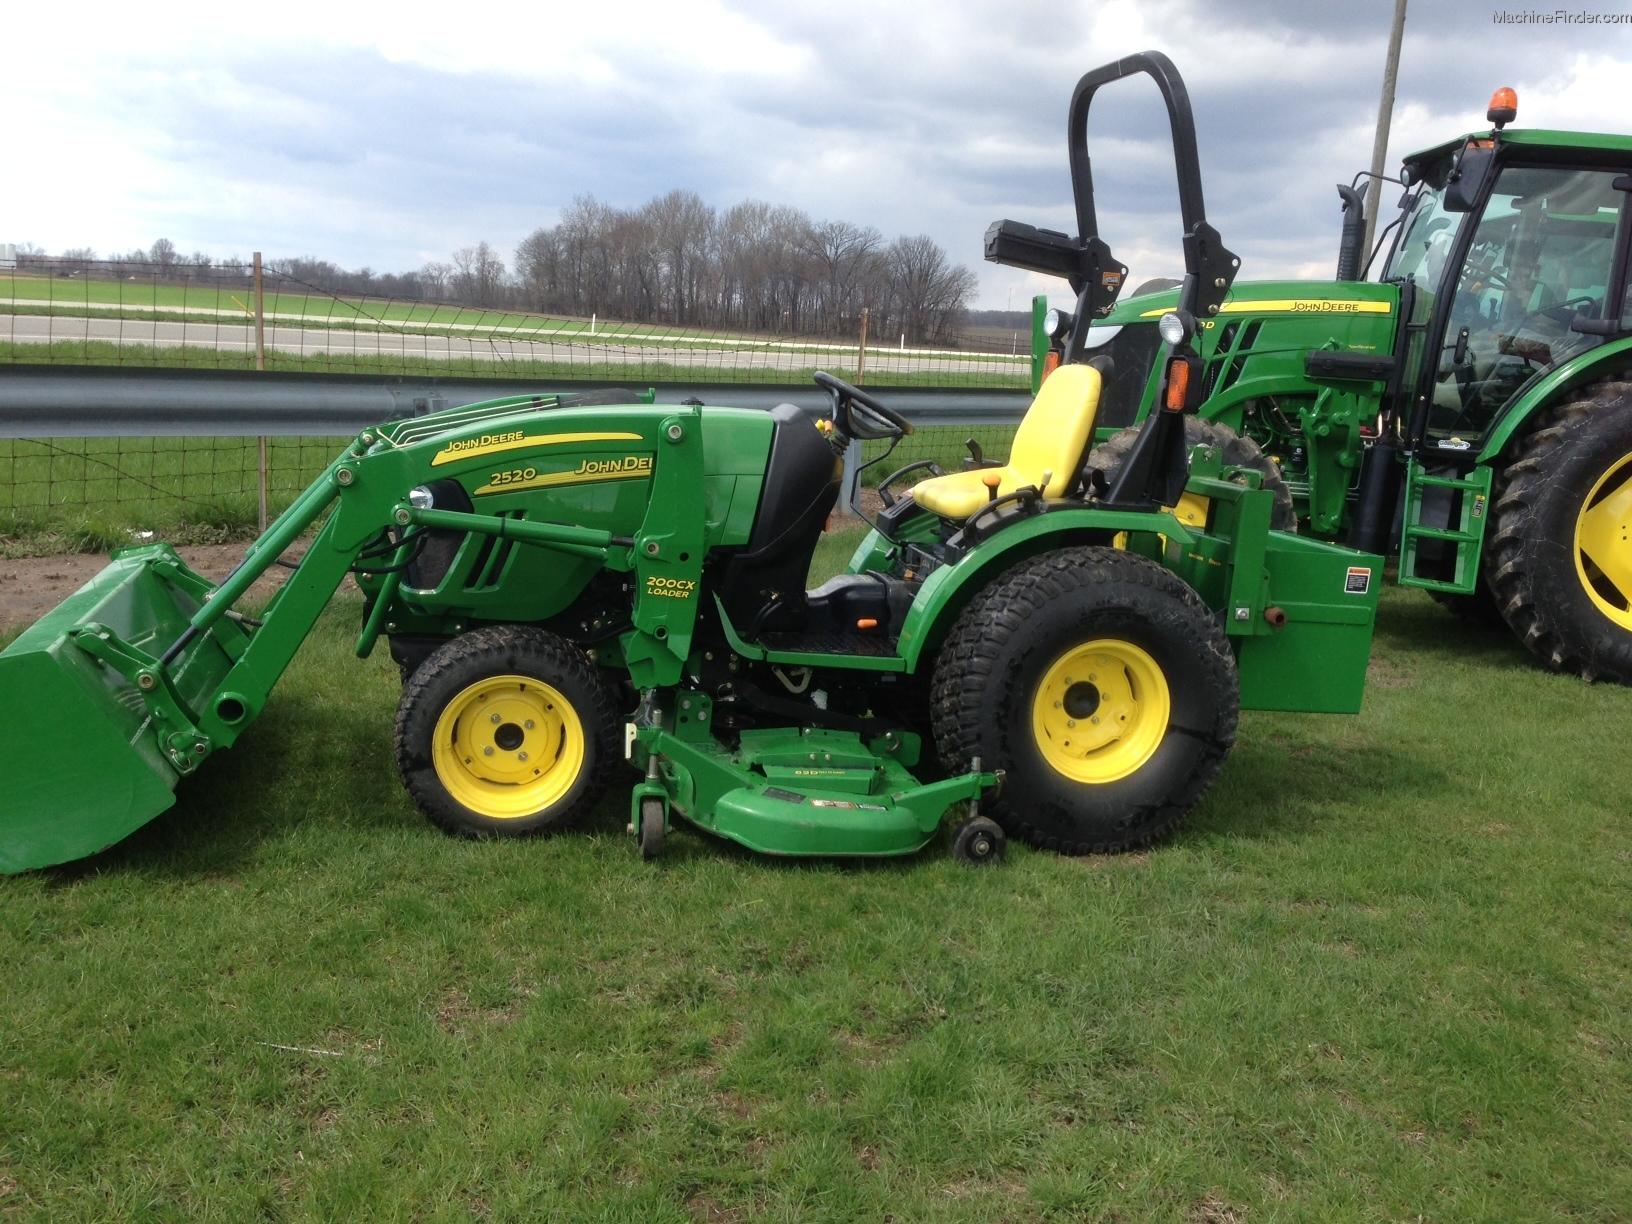 2007 John Deere 2520 Tractors - Compact (1-40hp.) - John ...